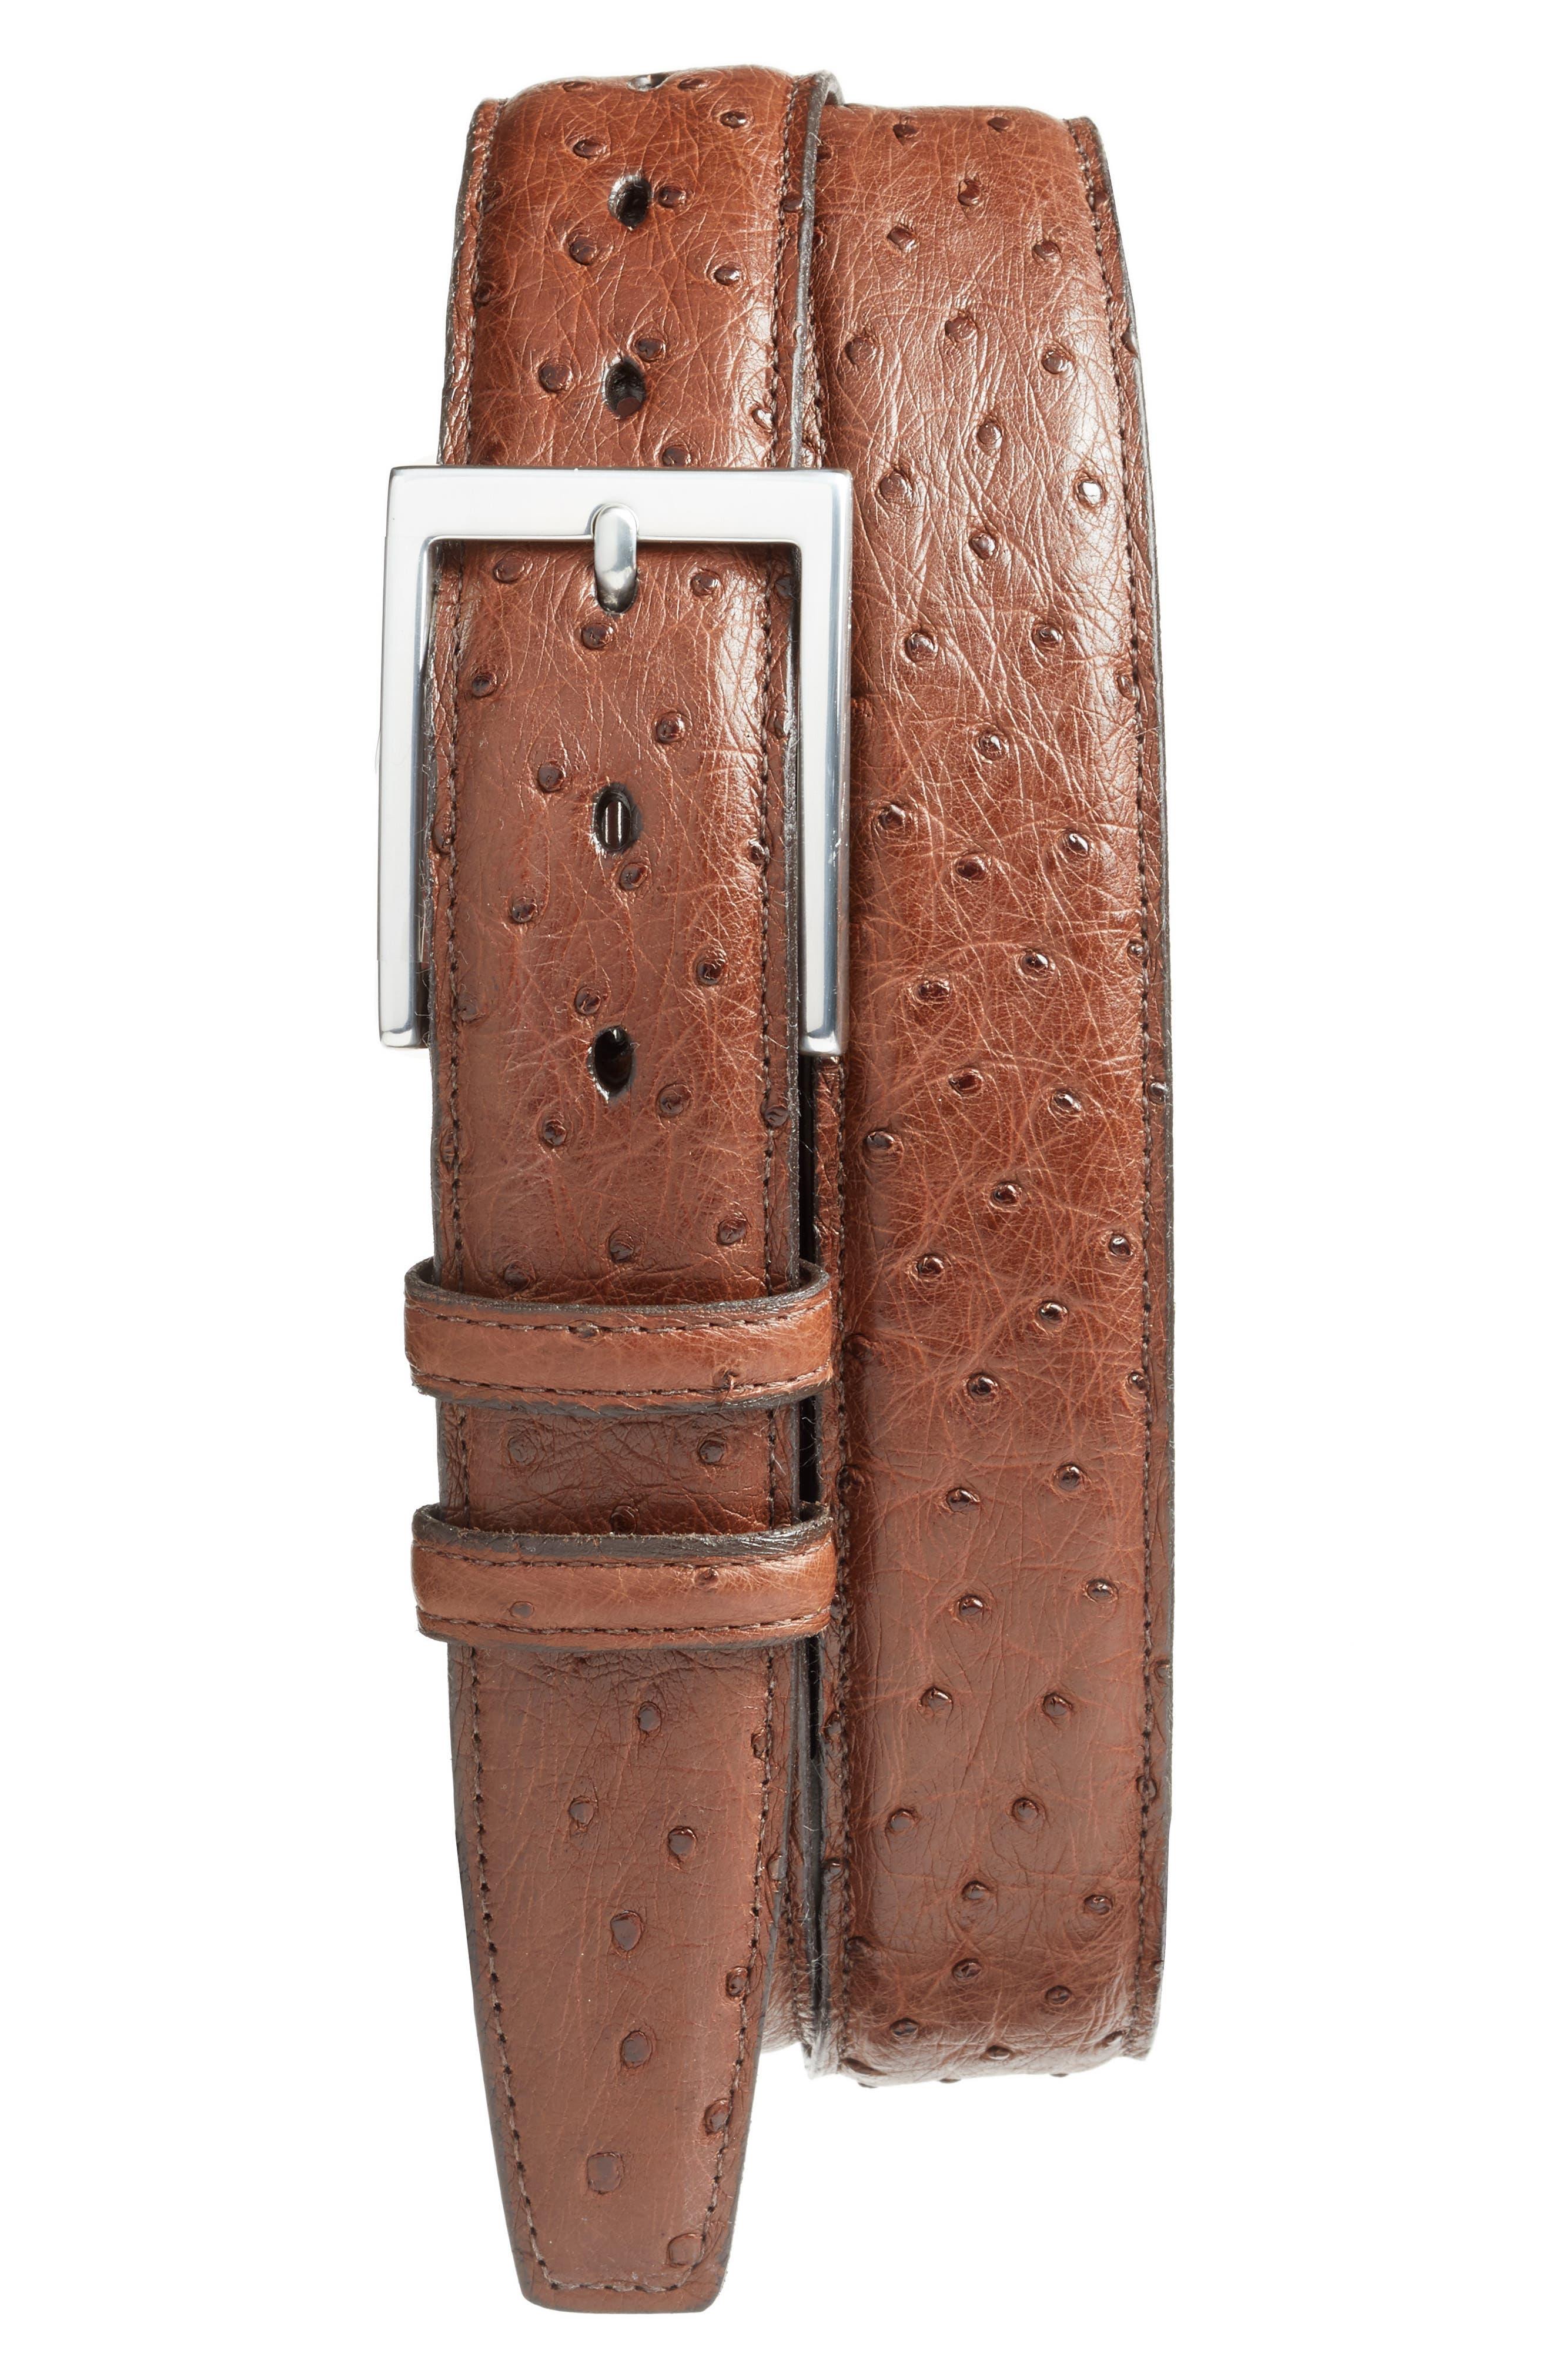 Main Image - Torino Belts Ostrich Leather Belt